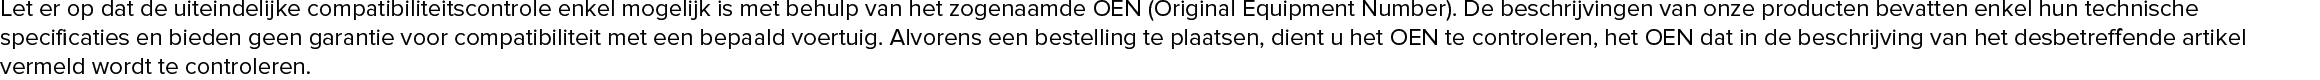 DENSO 670.4.016.1B, ZH98000-2000, 92070-1143, 92070-1148, 92070-1151 Bougie